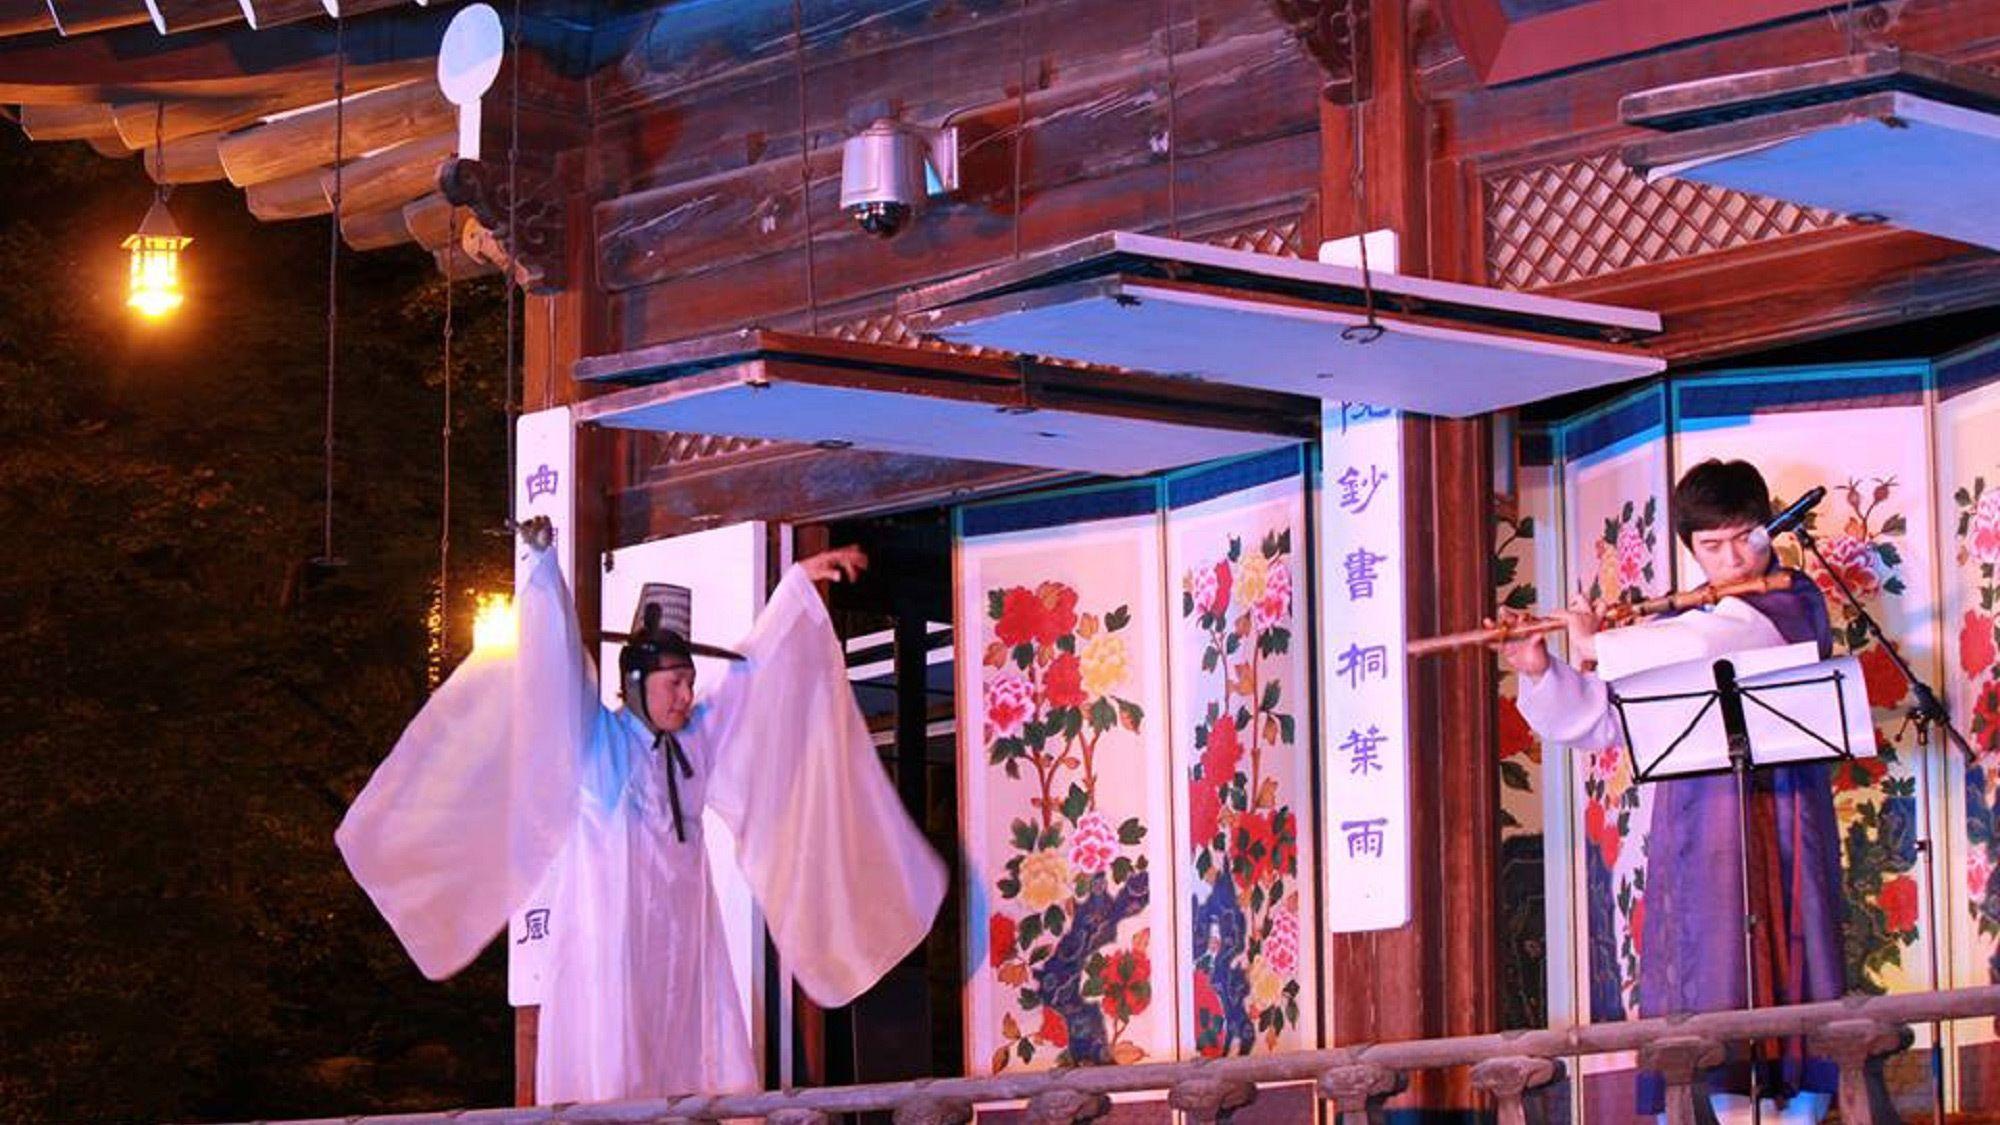 Impressive performance at the Korea House in Seoul